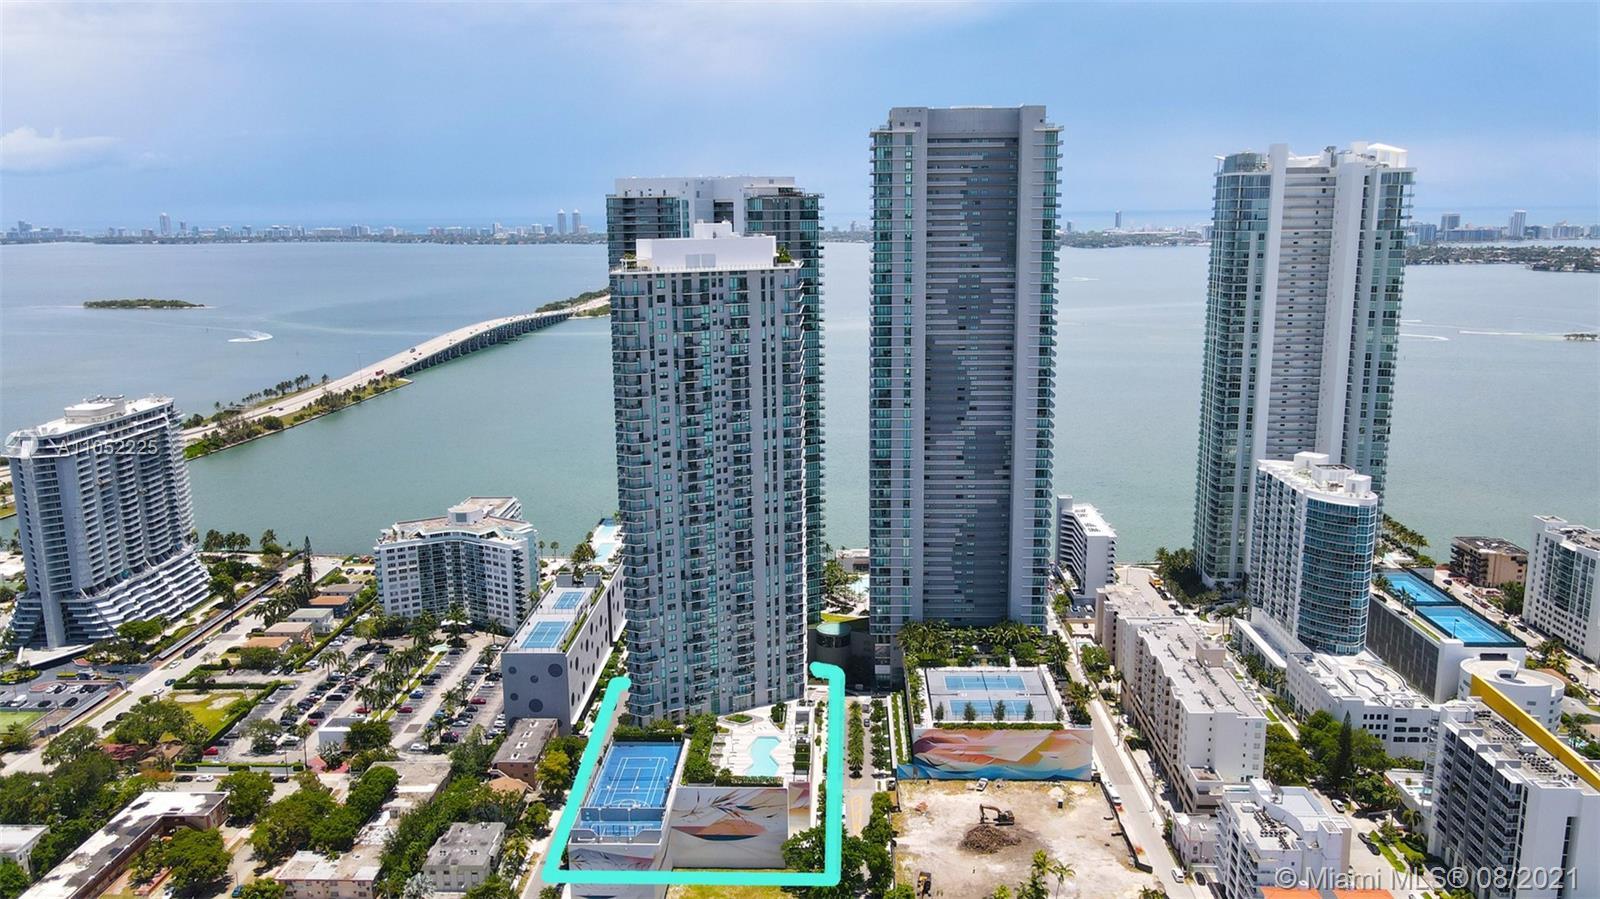 Paraiso Bayviews #809 - 501 NE 31st ST #809, Miami, FL 33137